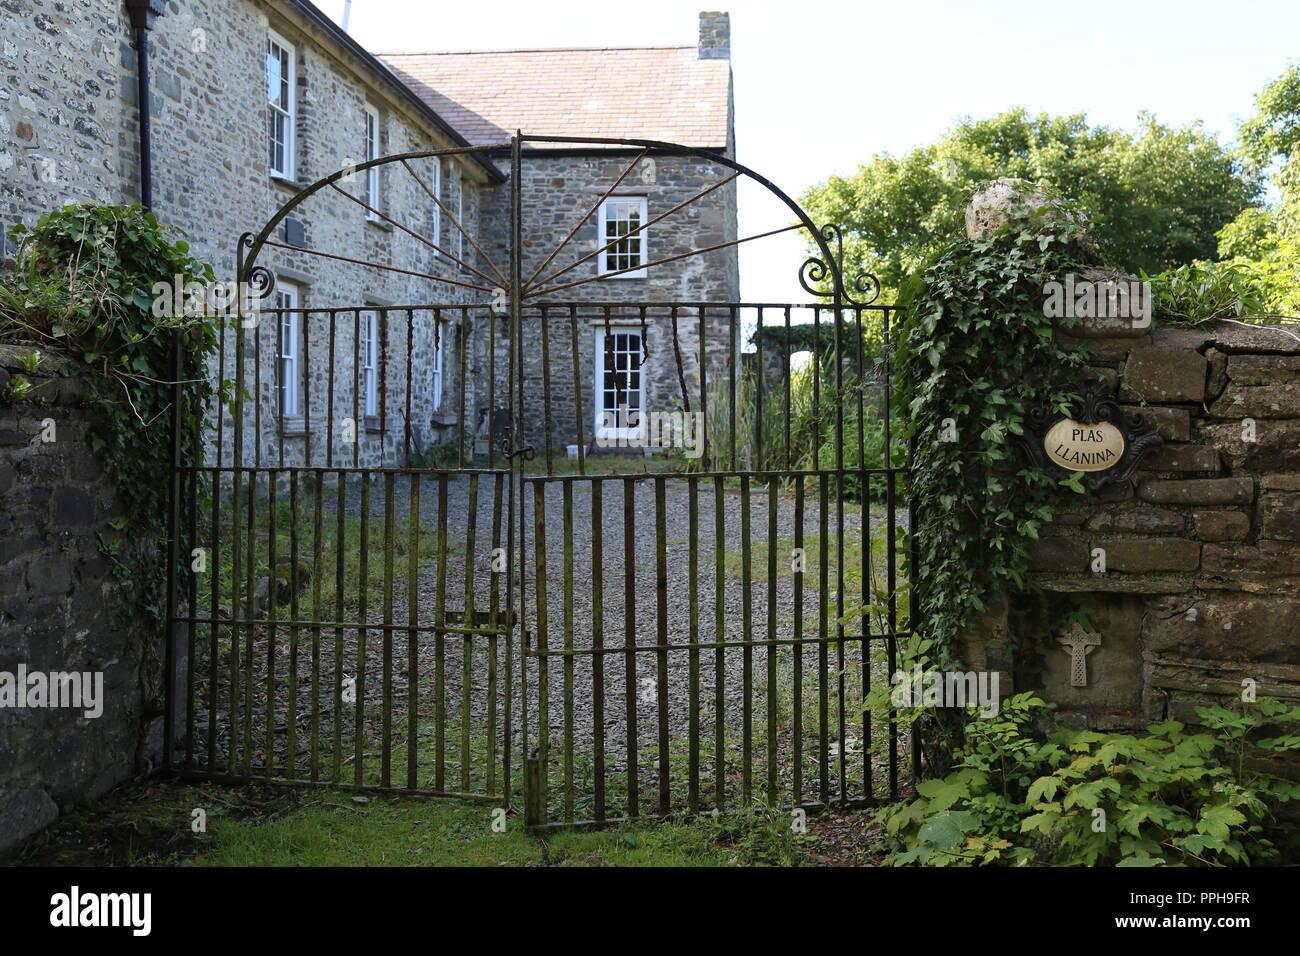 Plas Llanina, Dylan Thomas Trail, New Quay, Cardigan Bay, Ceredigion, Wales, Great Britain, United Kingdom, UK, Europe - Stock Image